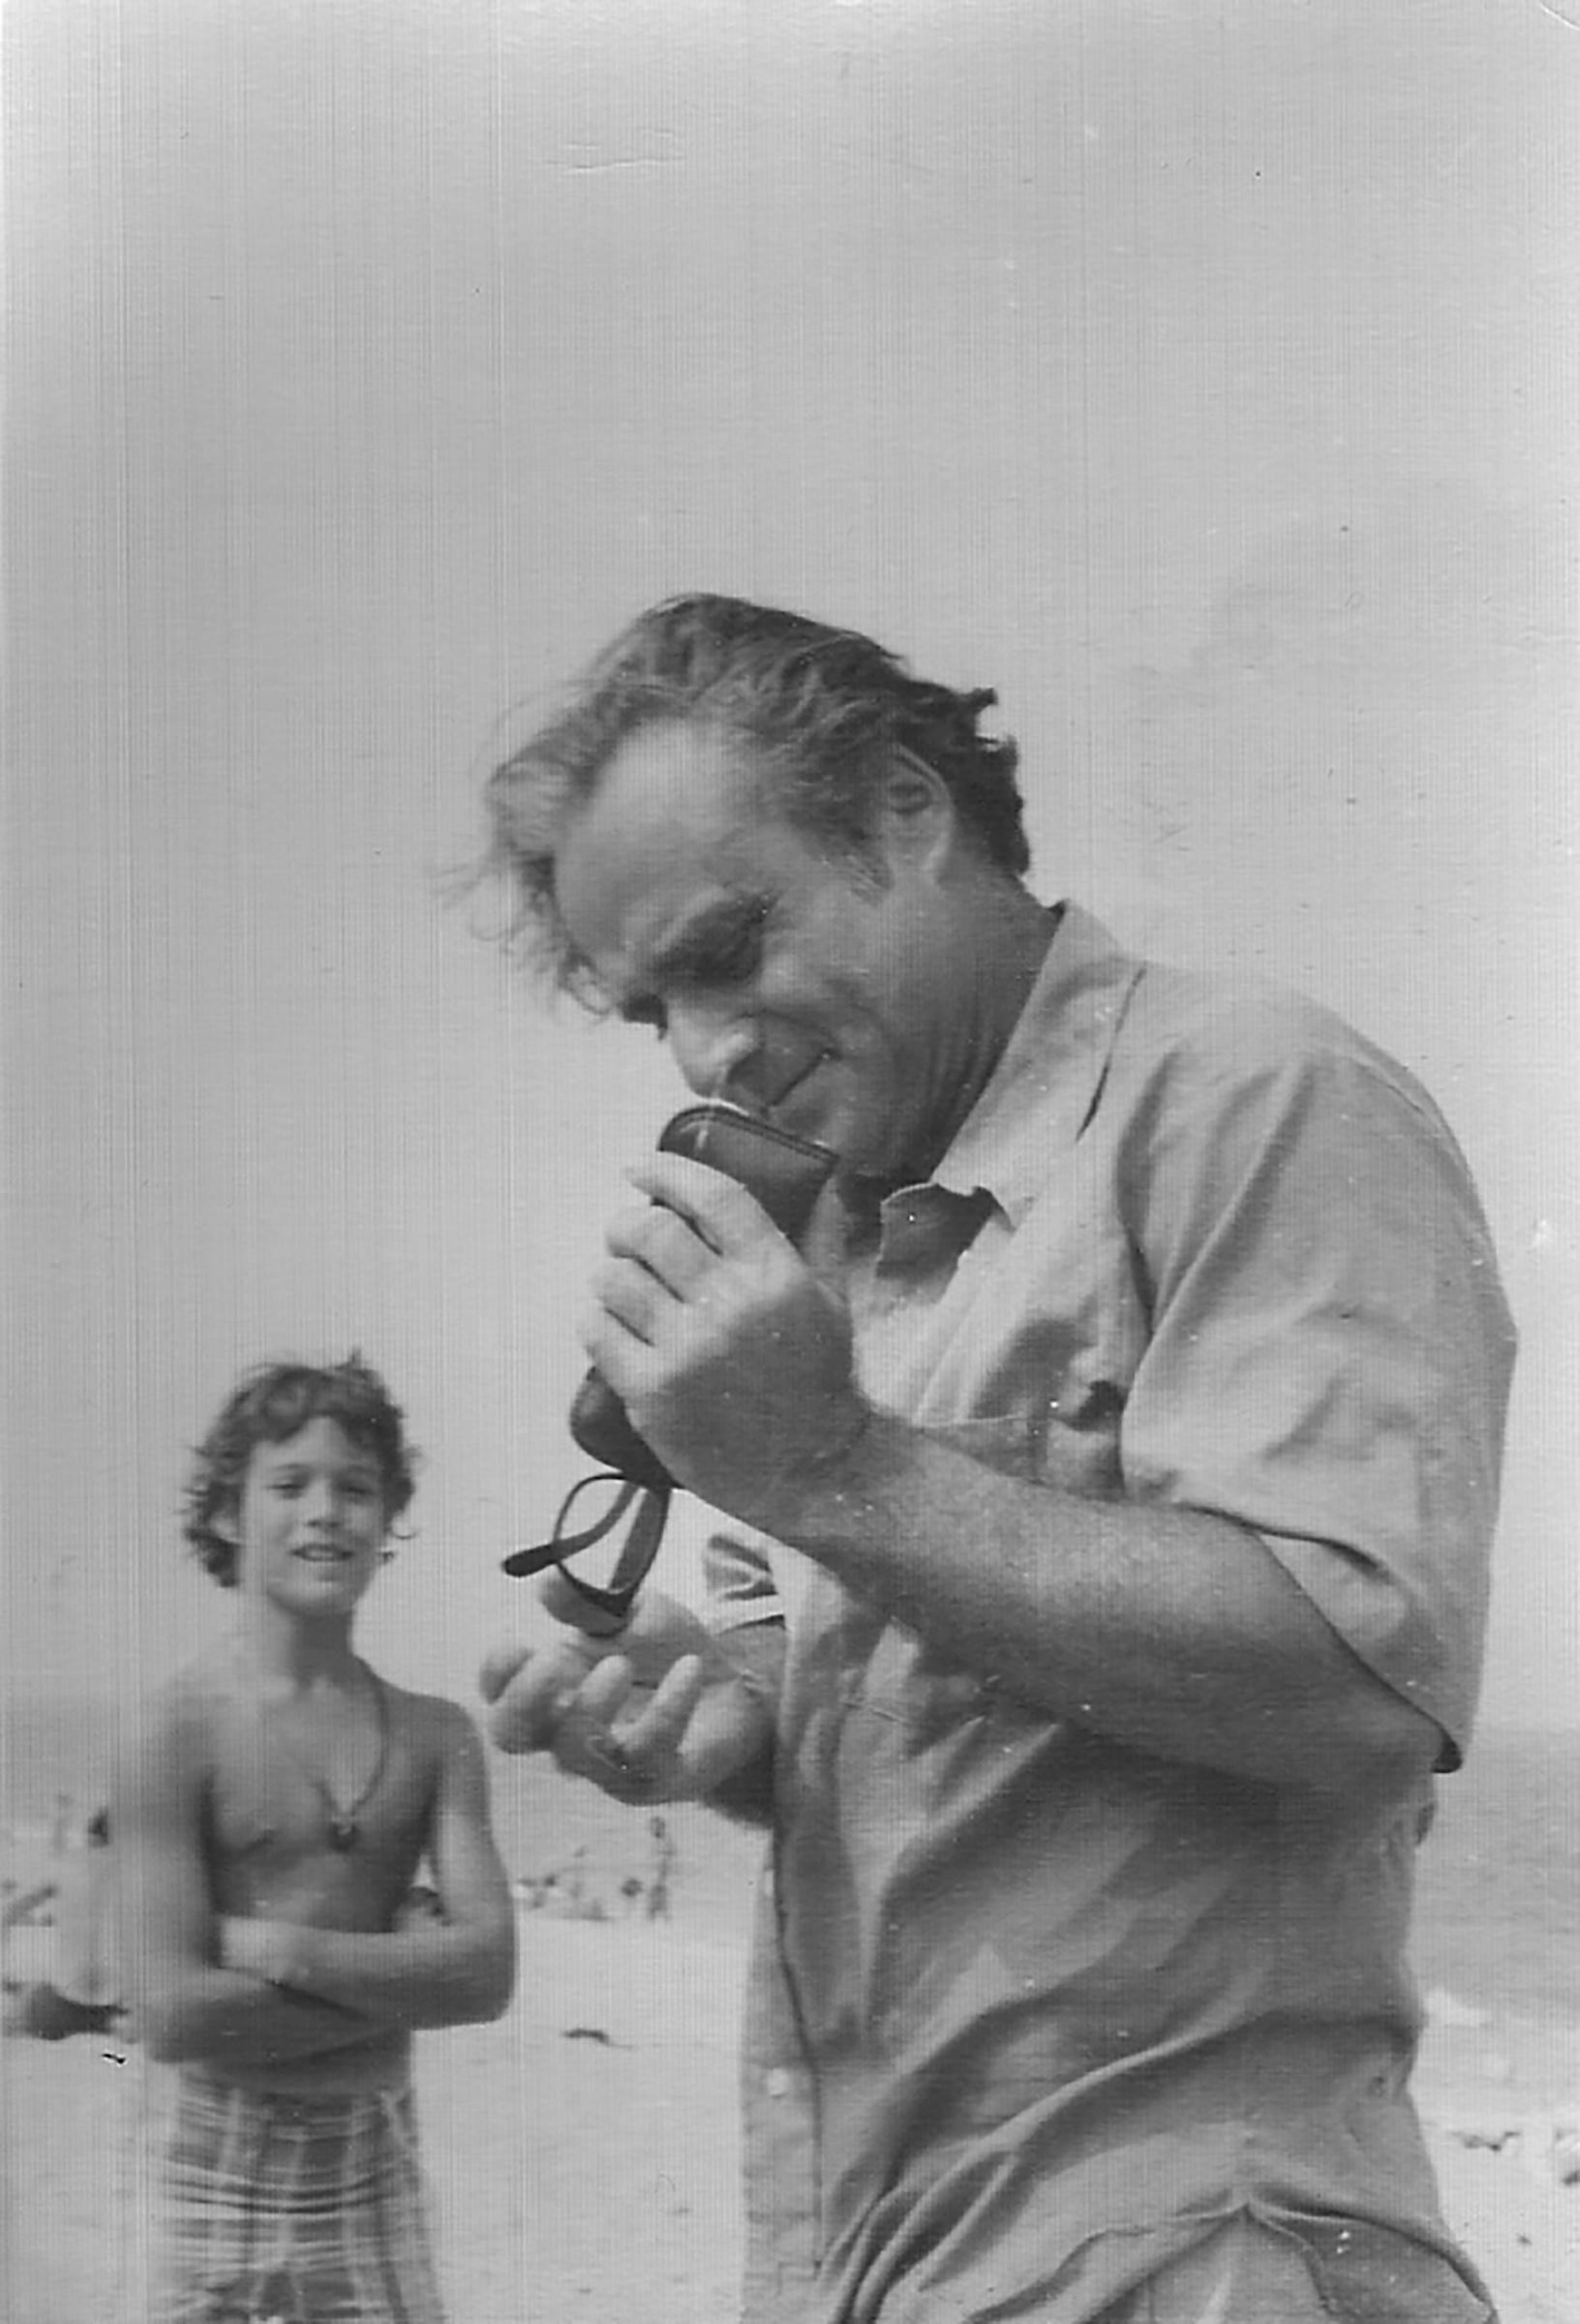 Miguel Chapiro Junger in Truro, Mass., circa 1972.